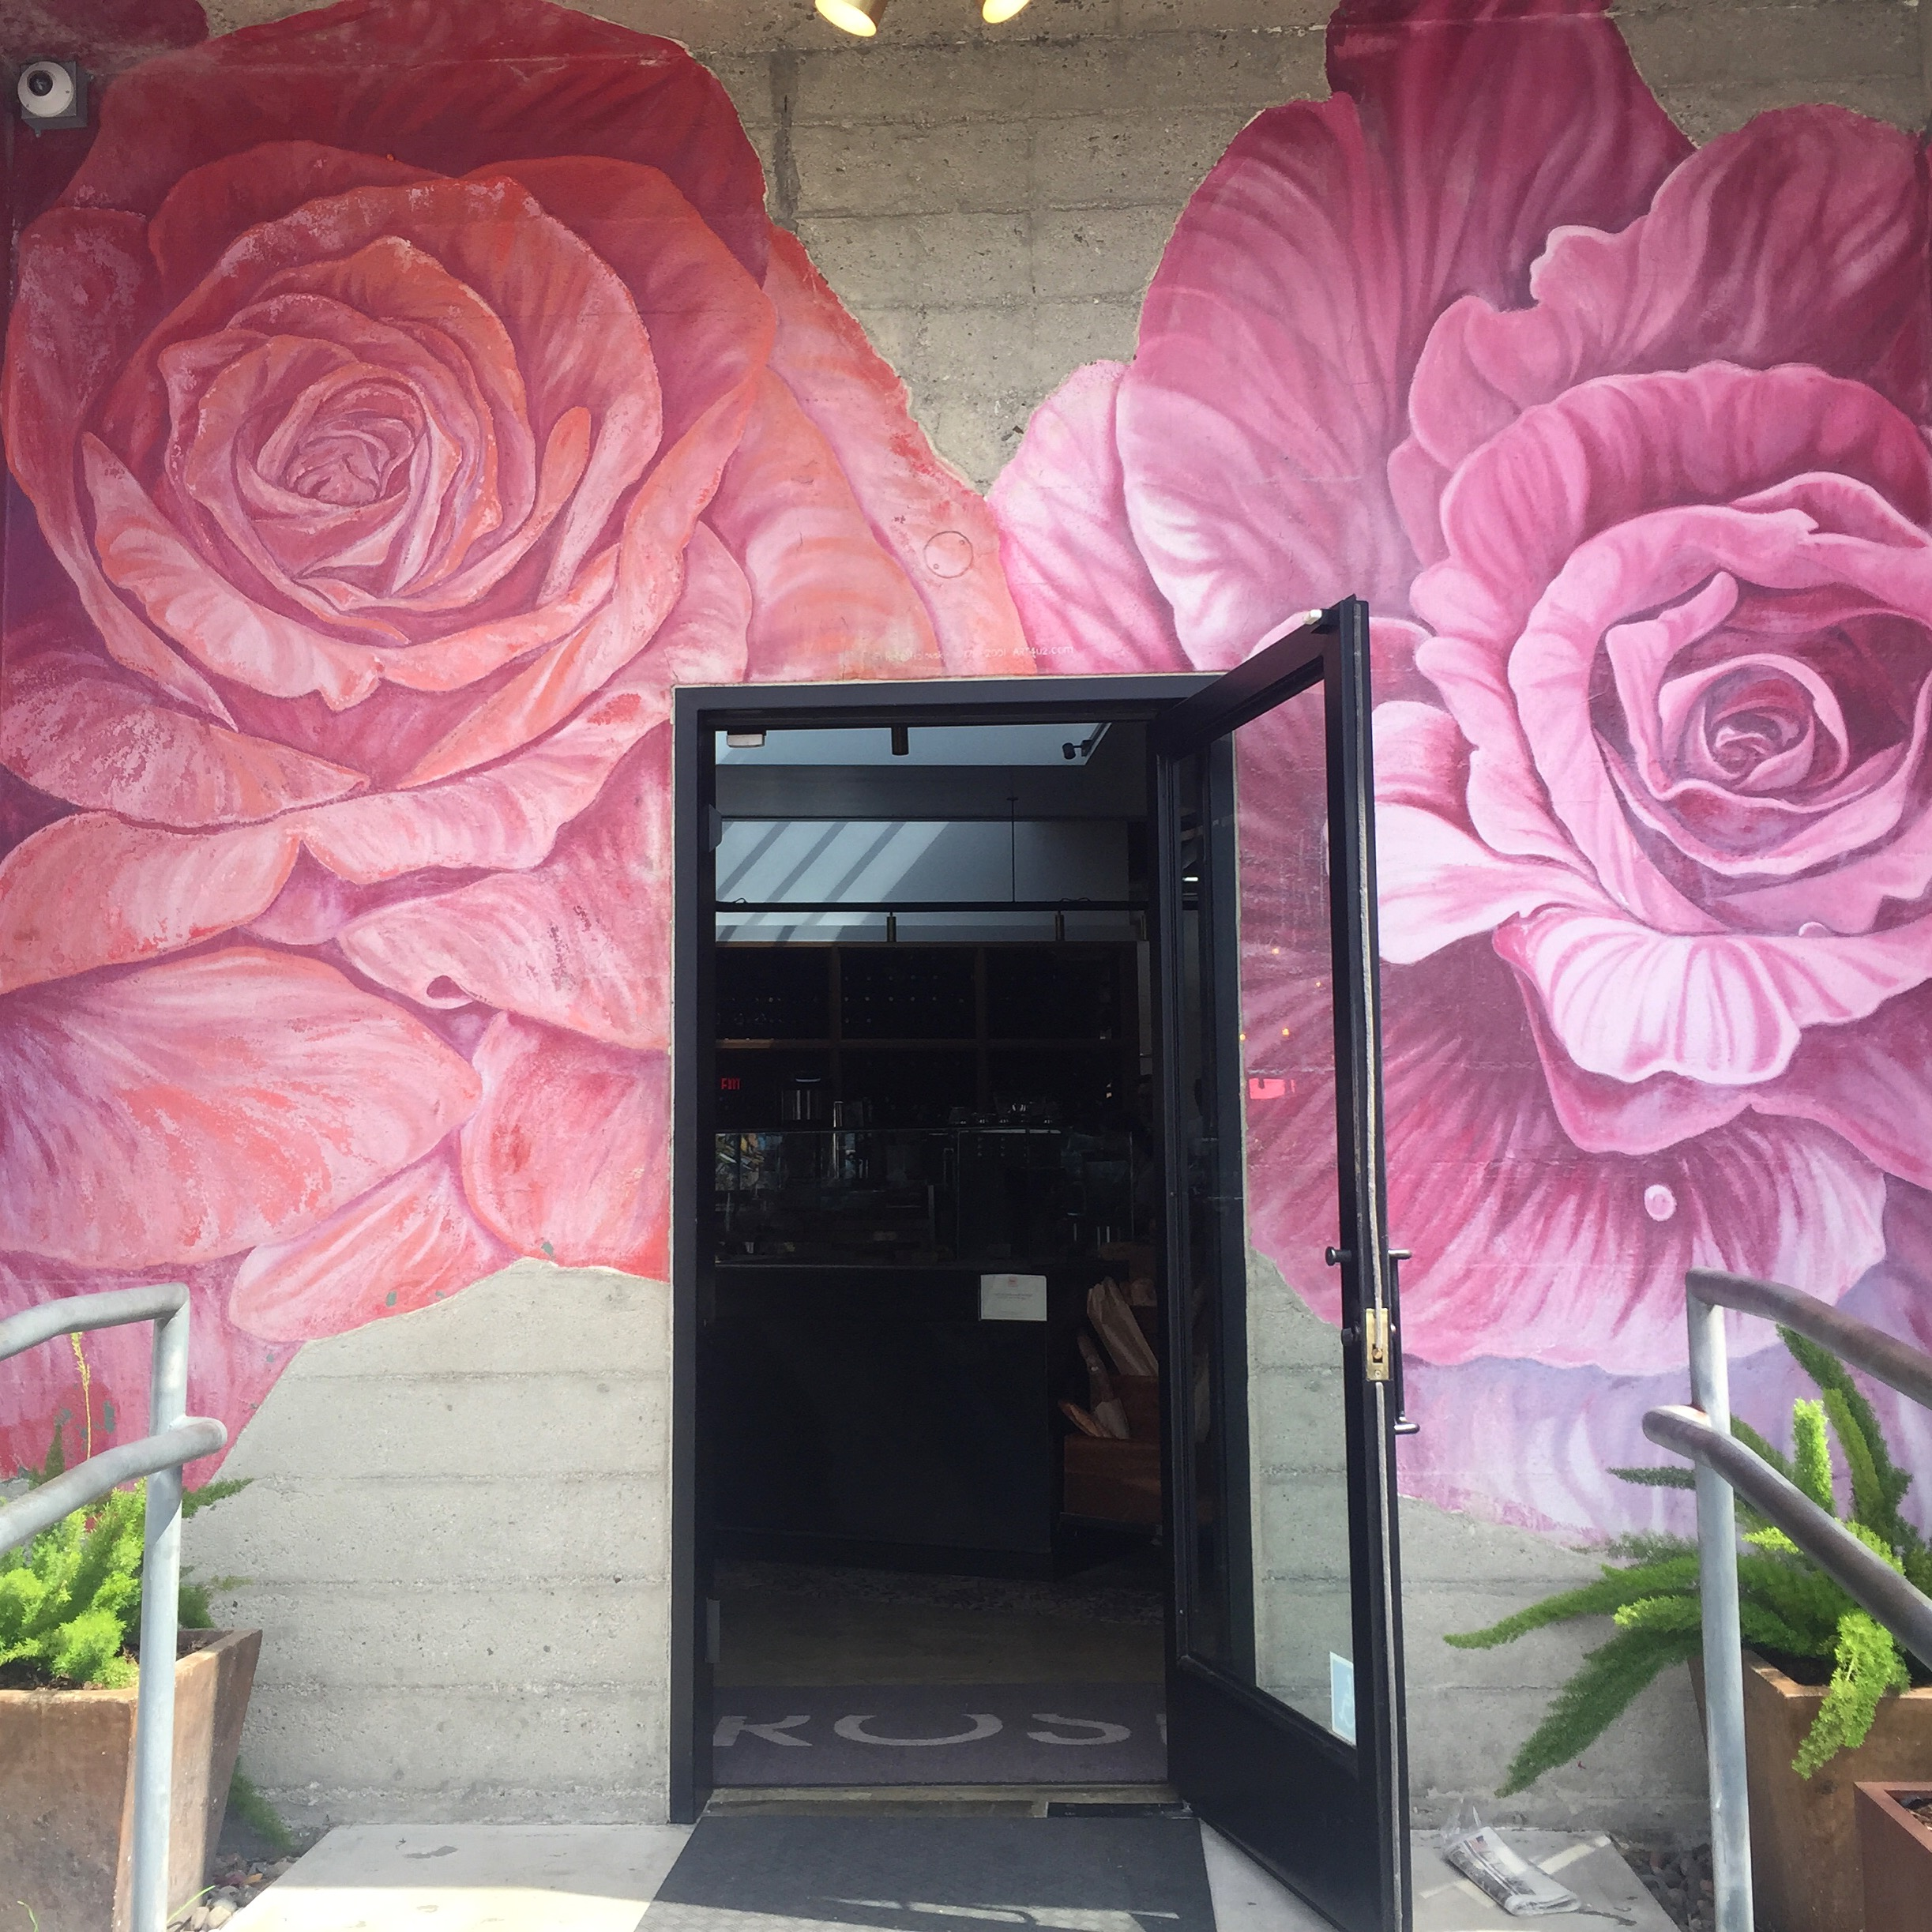 Rose Café in Venice Beach